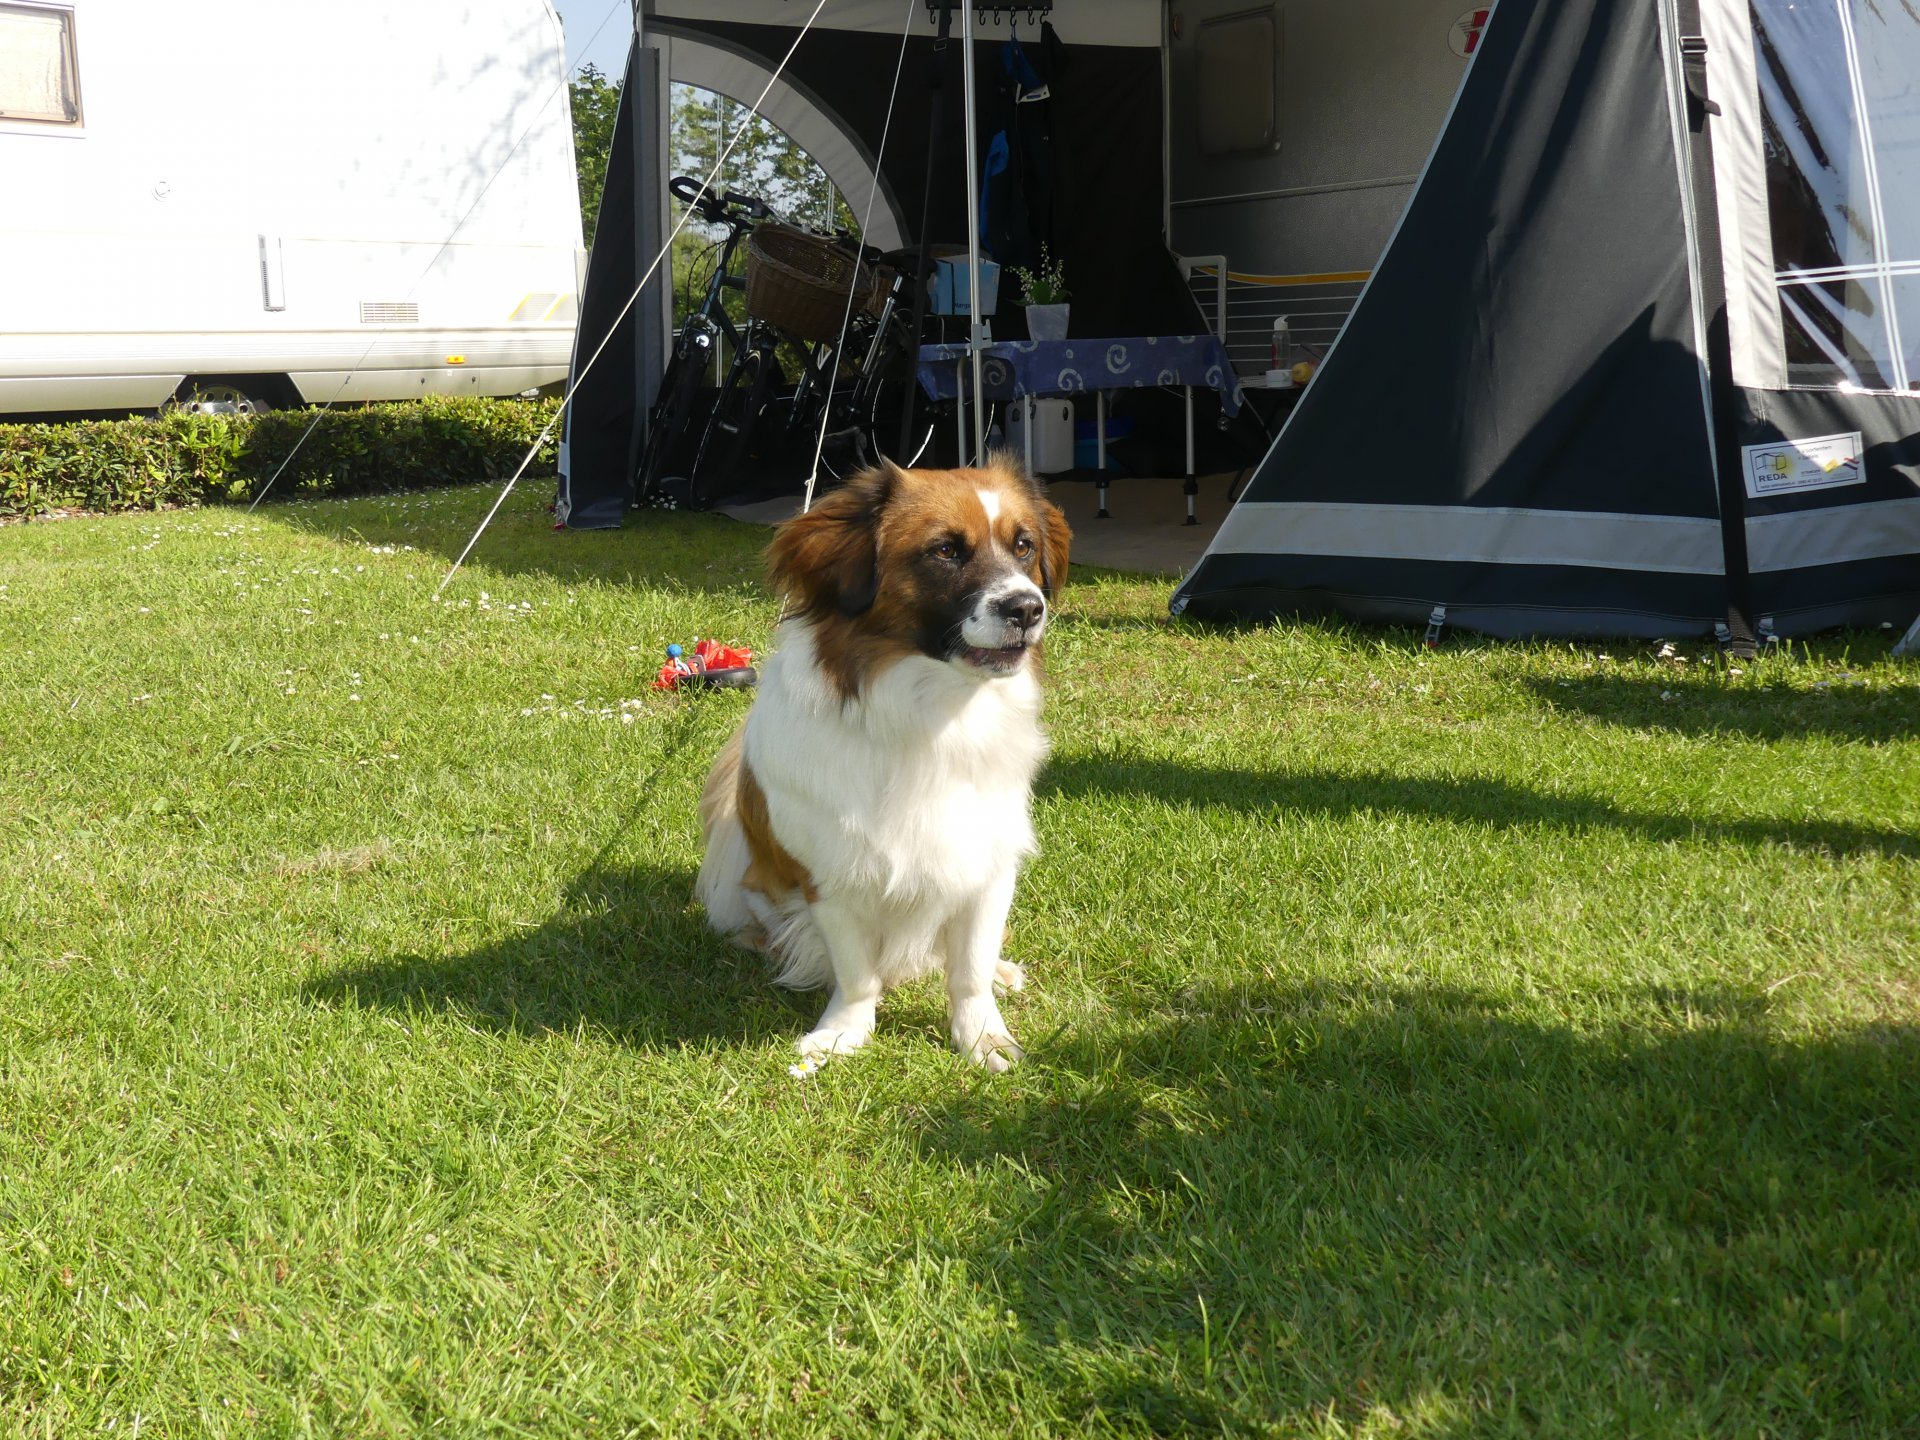 Hondencamping in Overijssel - Camping Heino